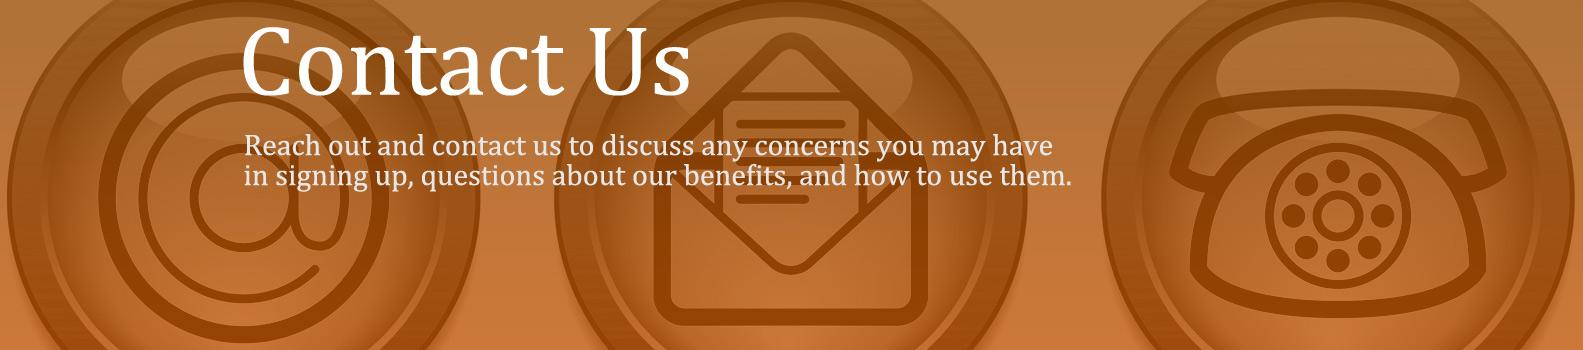 contact-us-header2